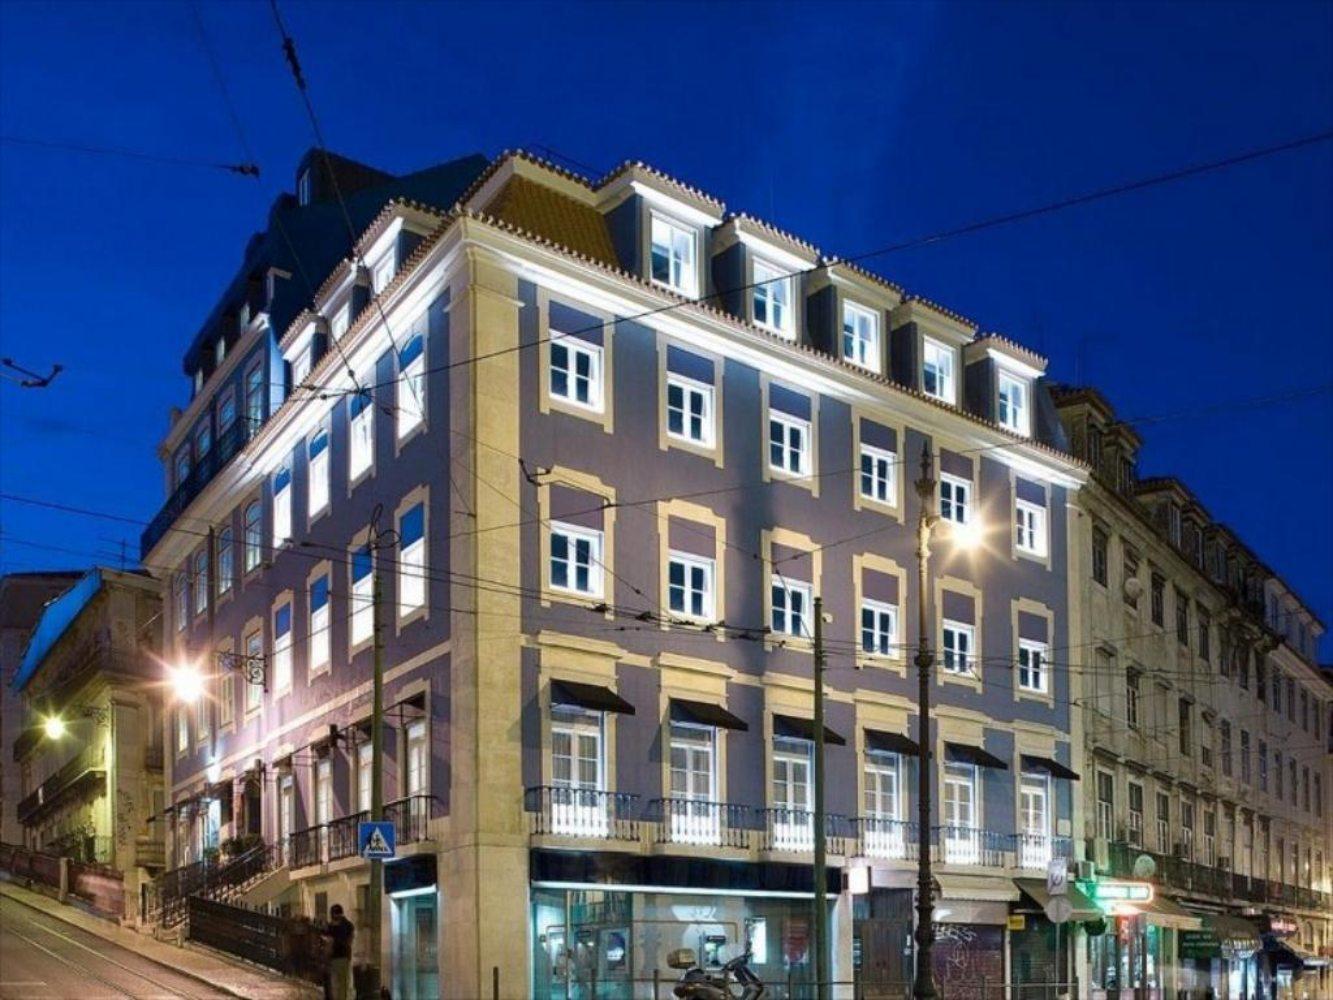 LX Boutique Hotel